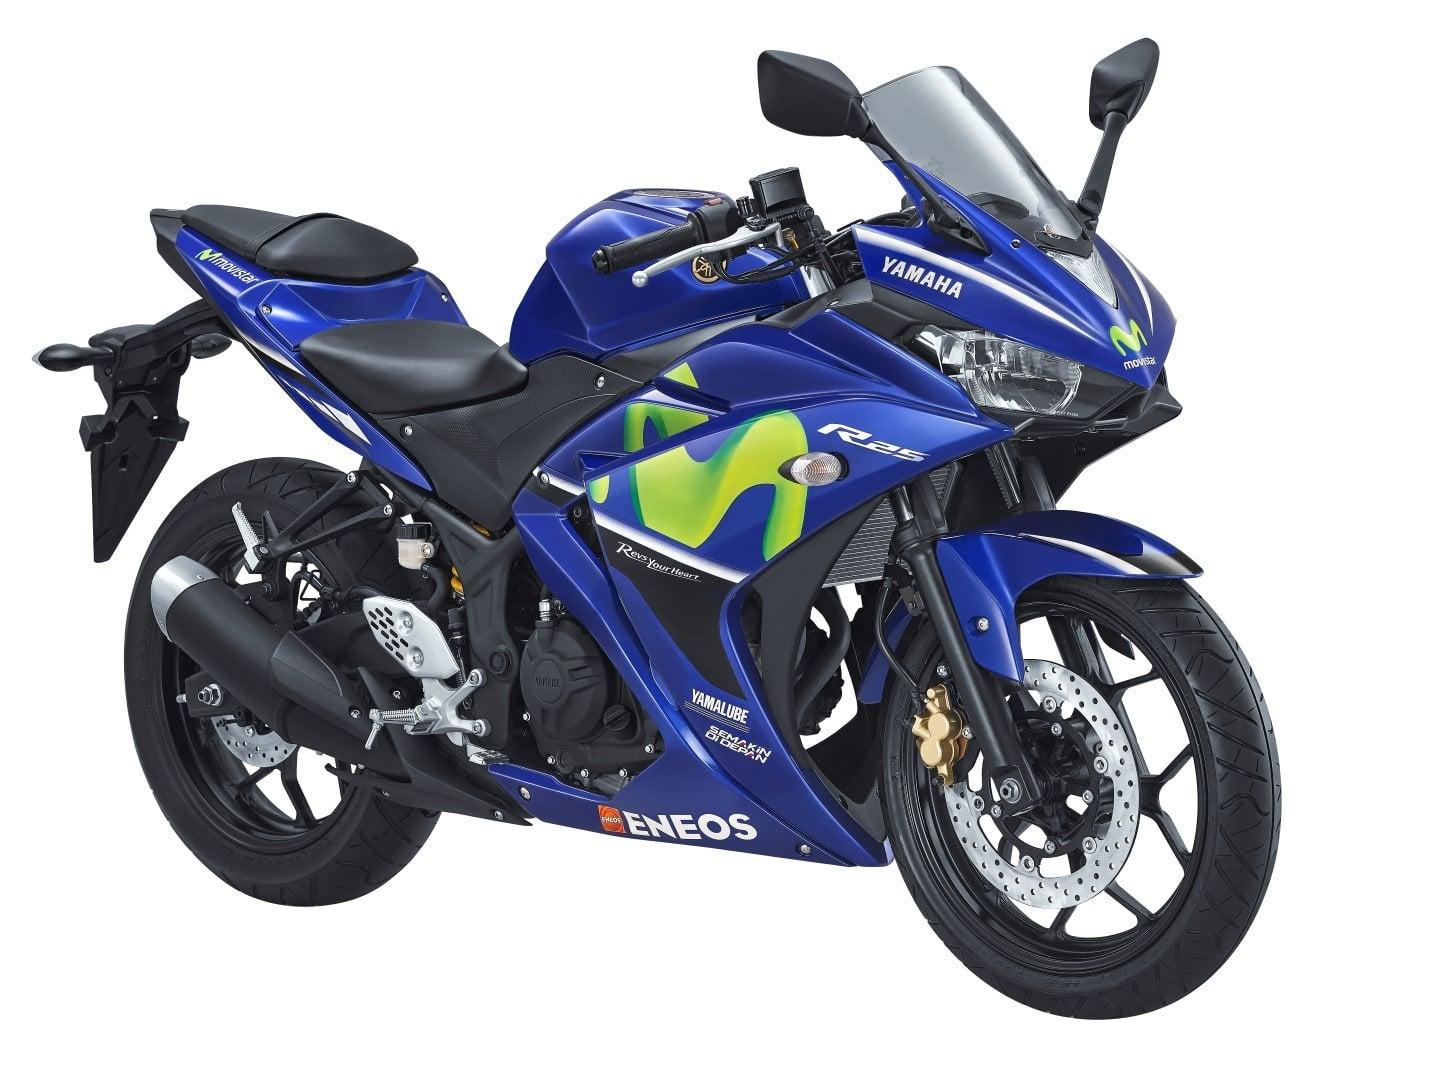 Yamaha Indonesia resmi merilis 5 motor berlivery MotoGP Movistar, harga naik sedikit saja